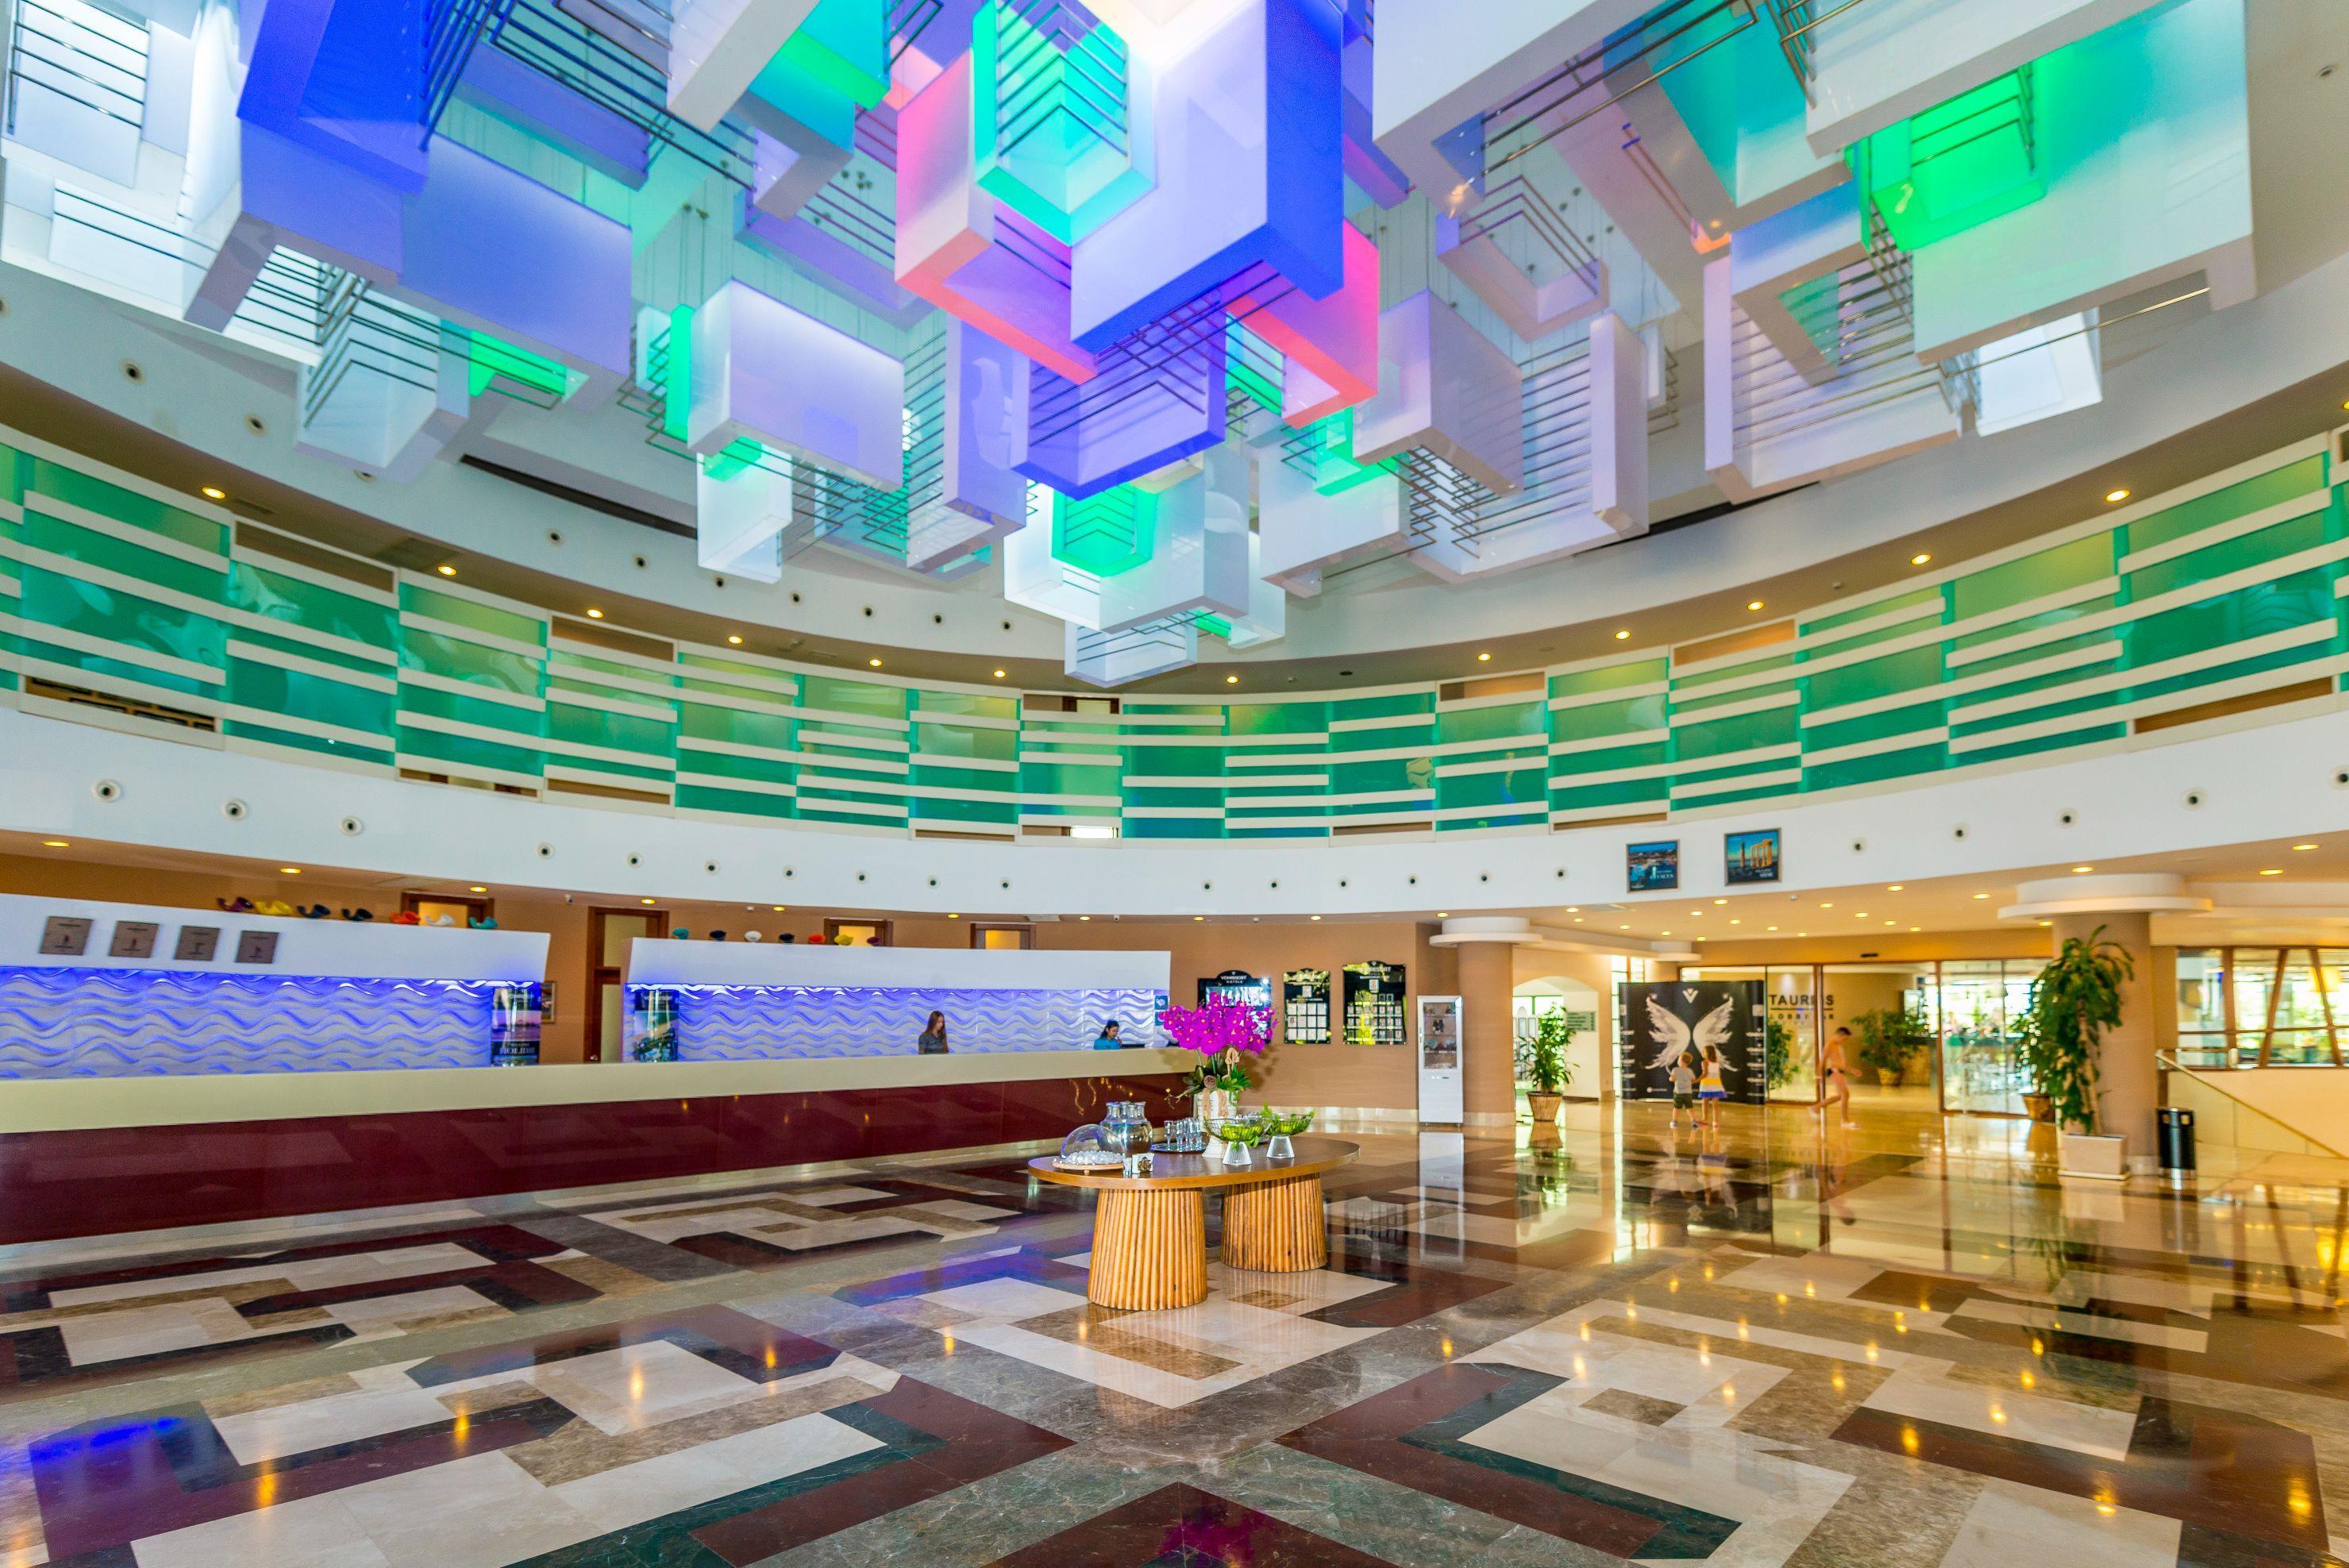 http://www.orextravel.sk/OREX/hotelphotos/vonresort-golden-coast-general-0041.jpg